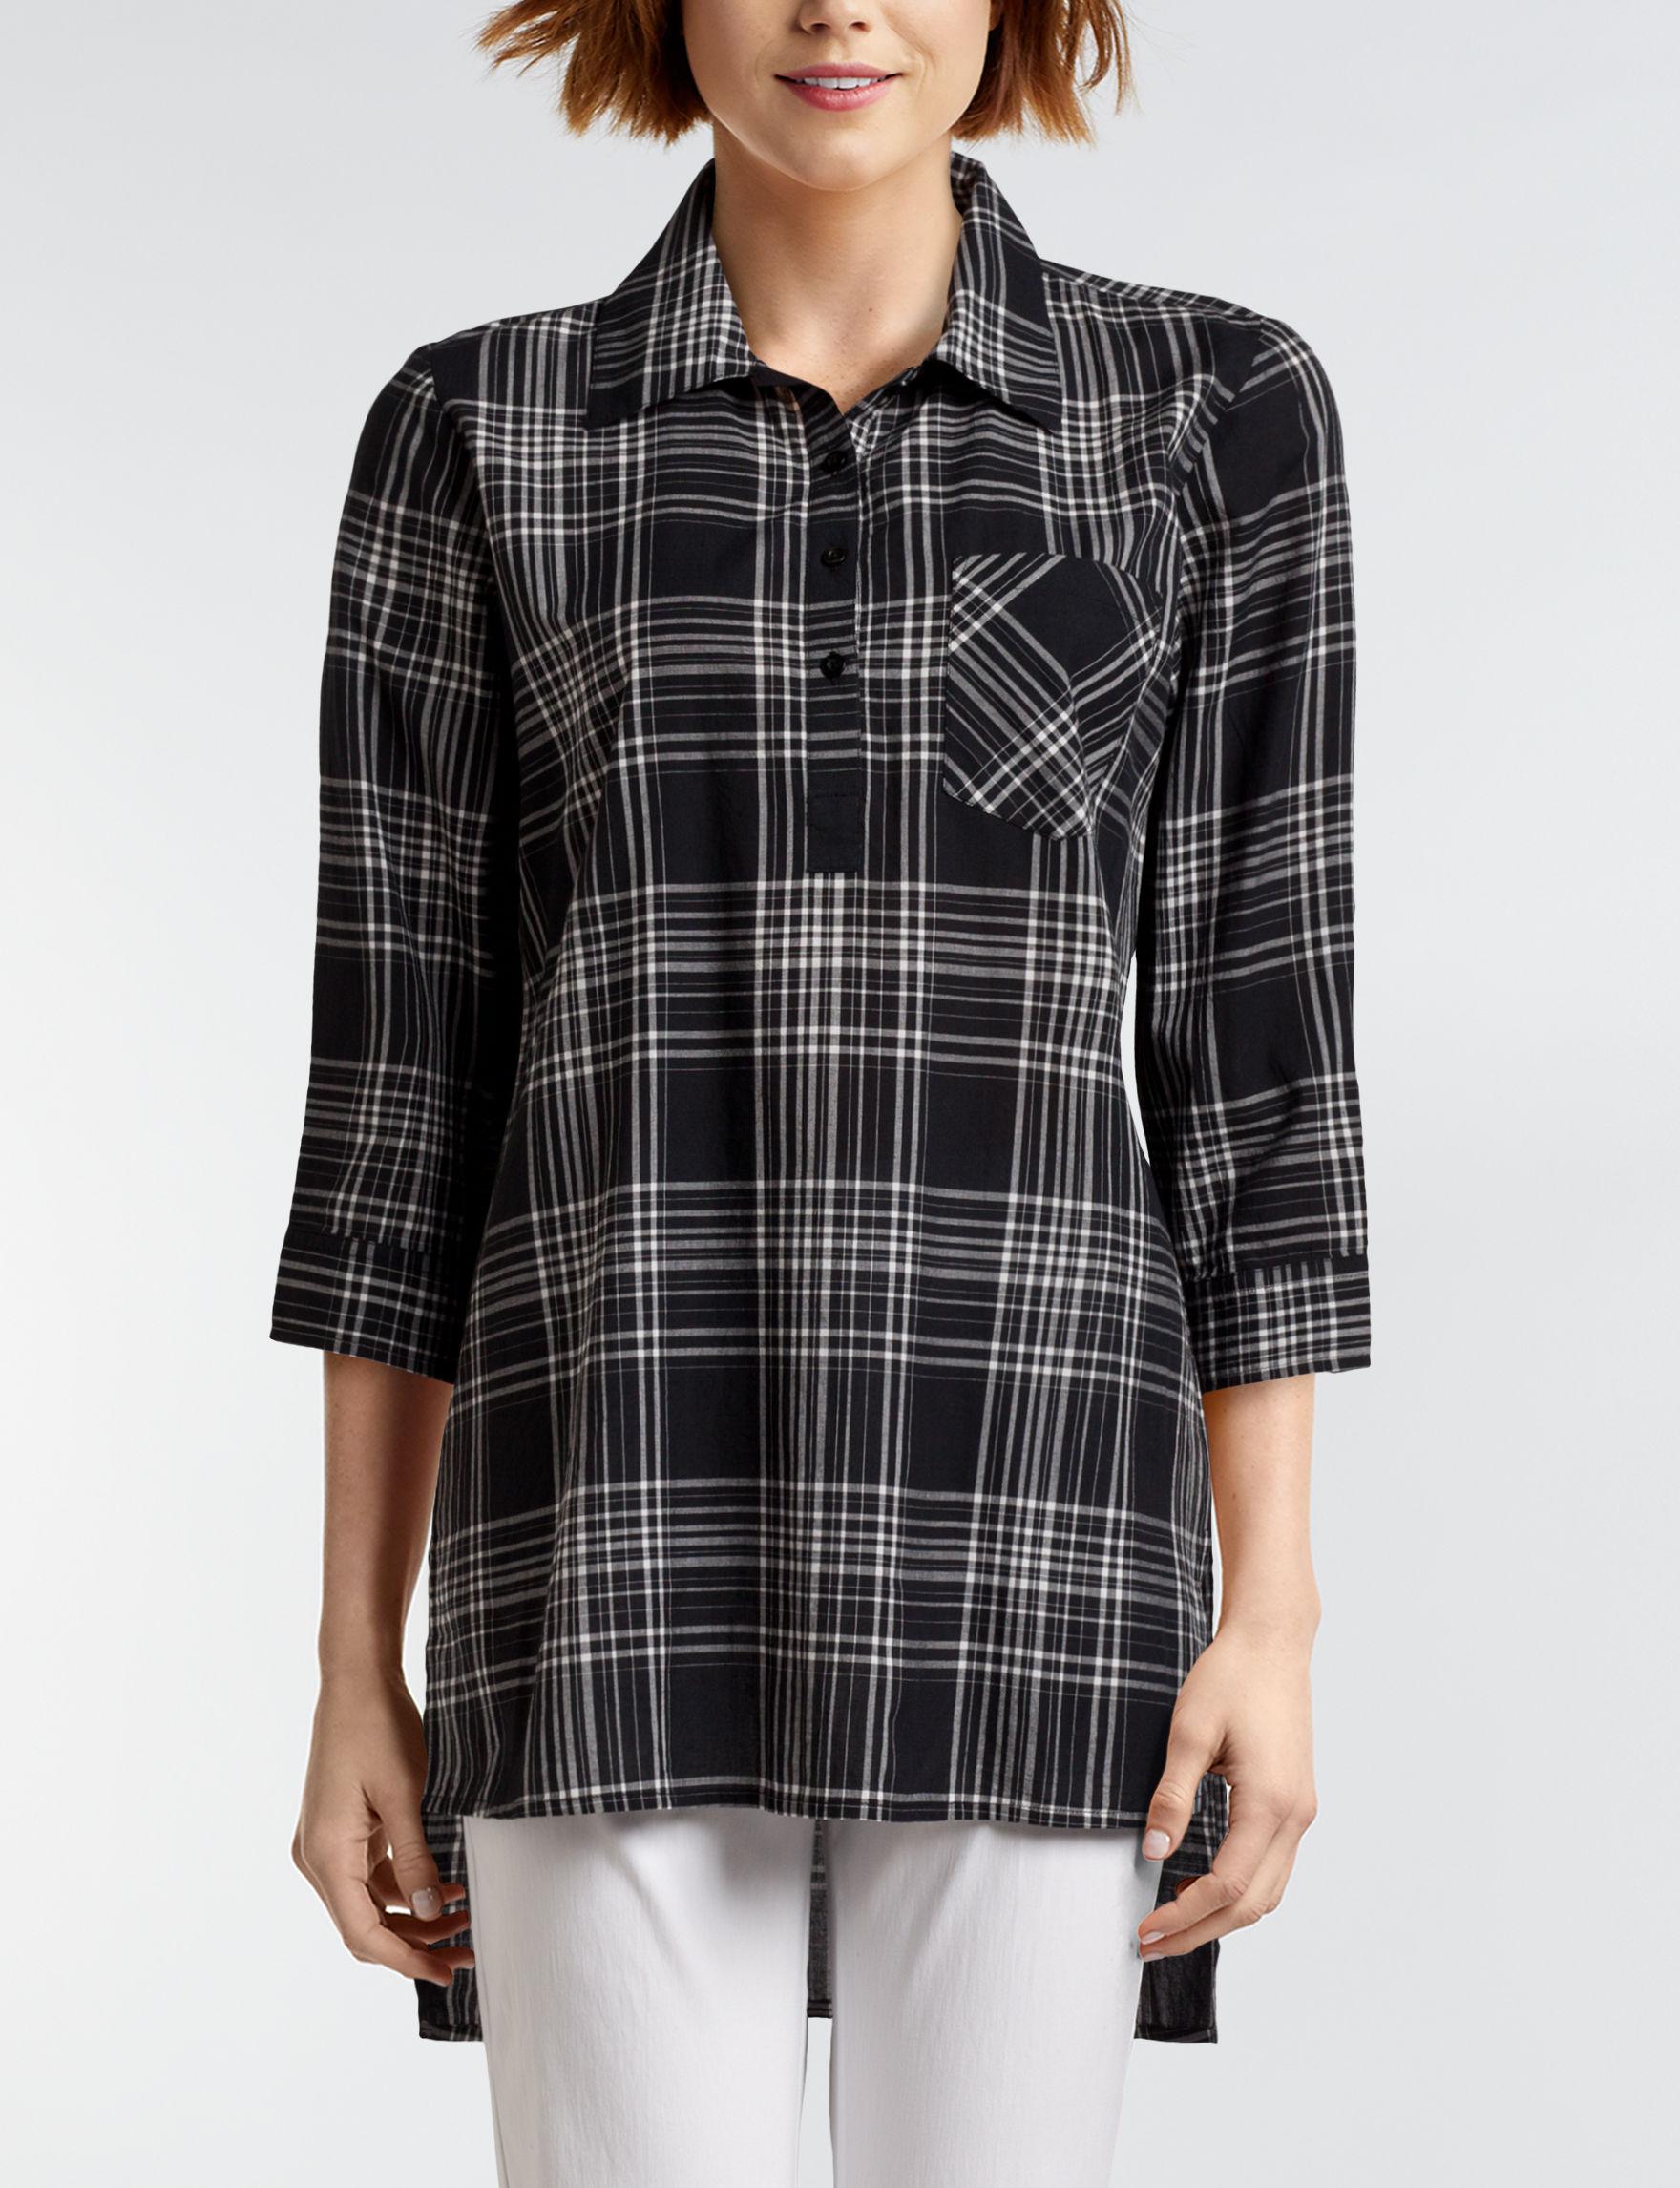 New Direction Black / White Shirts & Blouses